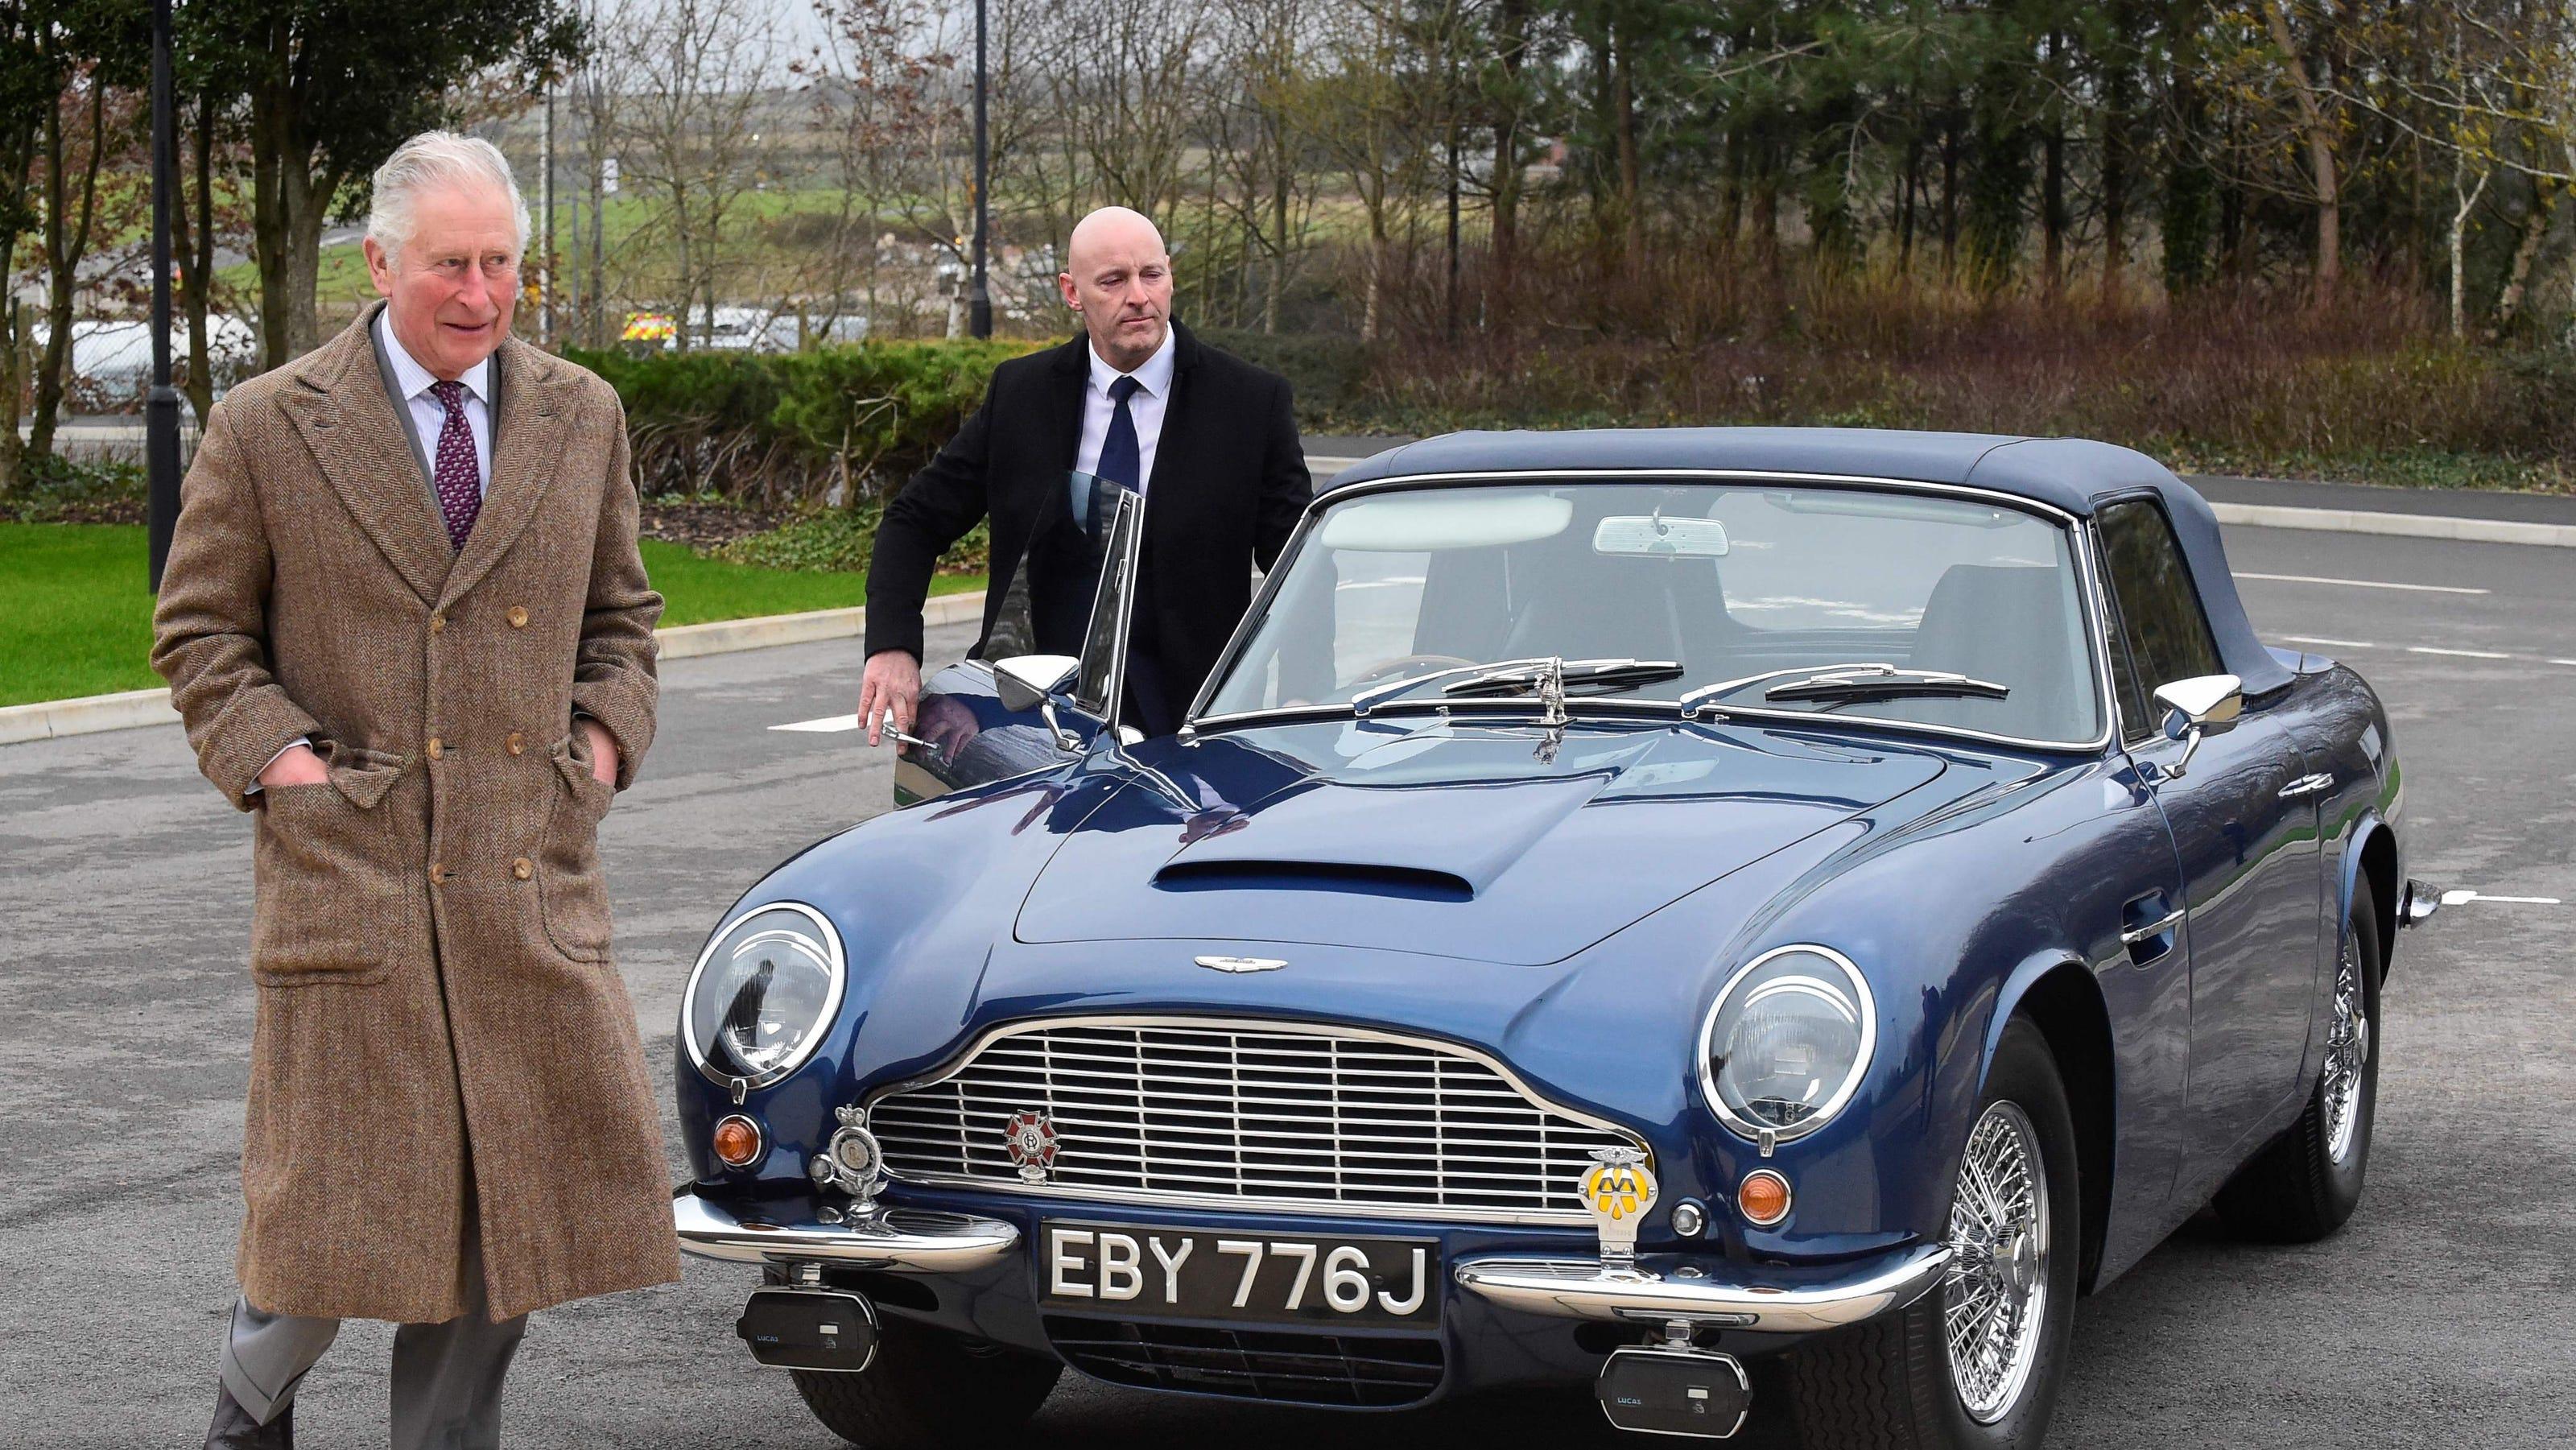 Prince Charles Shows Off Vintage Aston Martin Car During Wales Visit